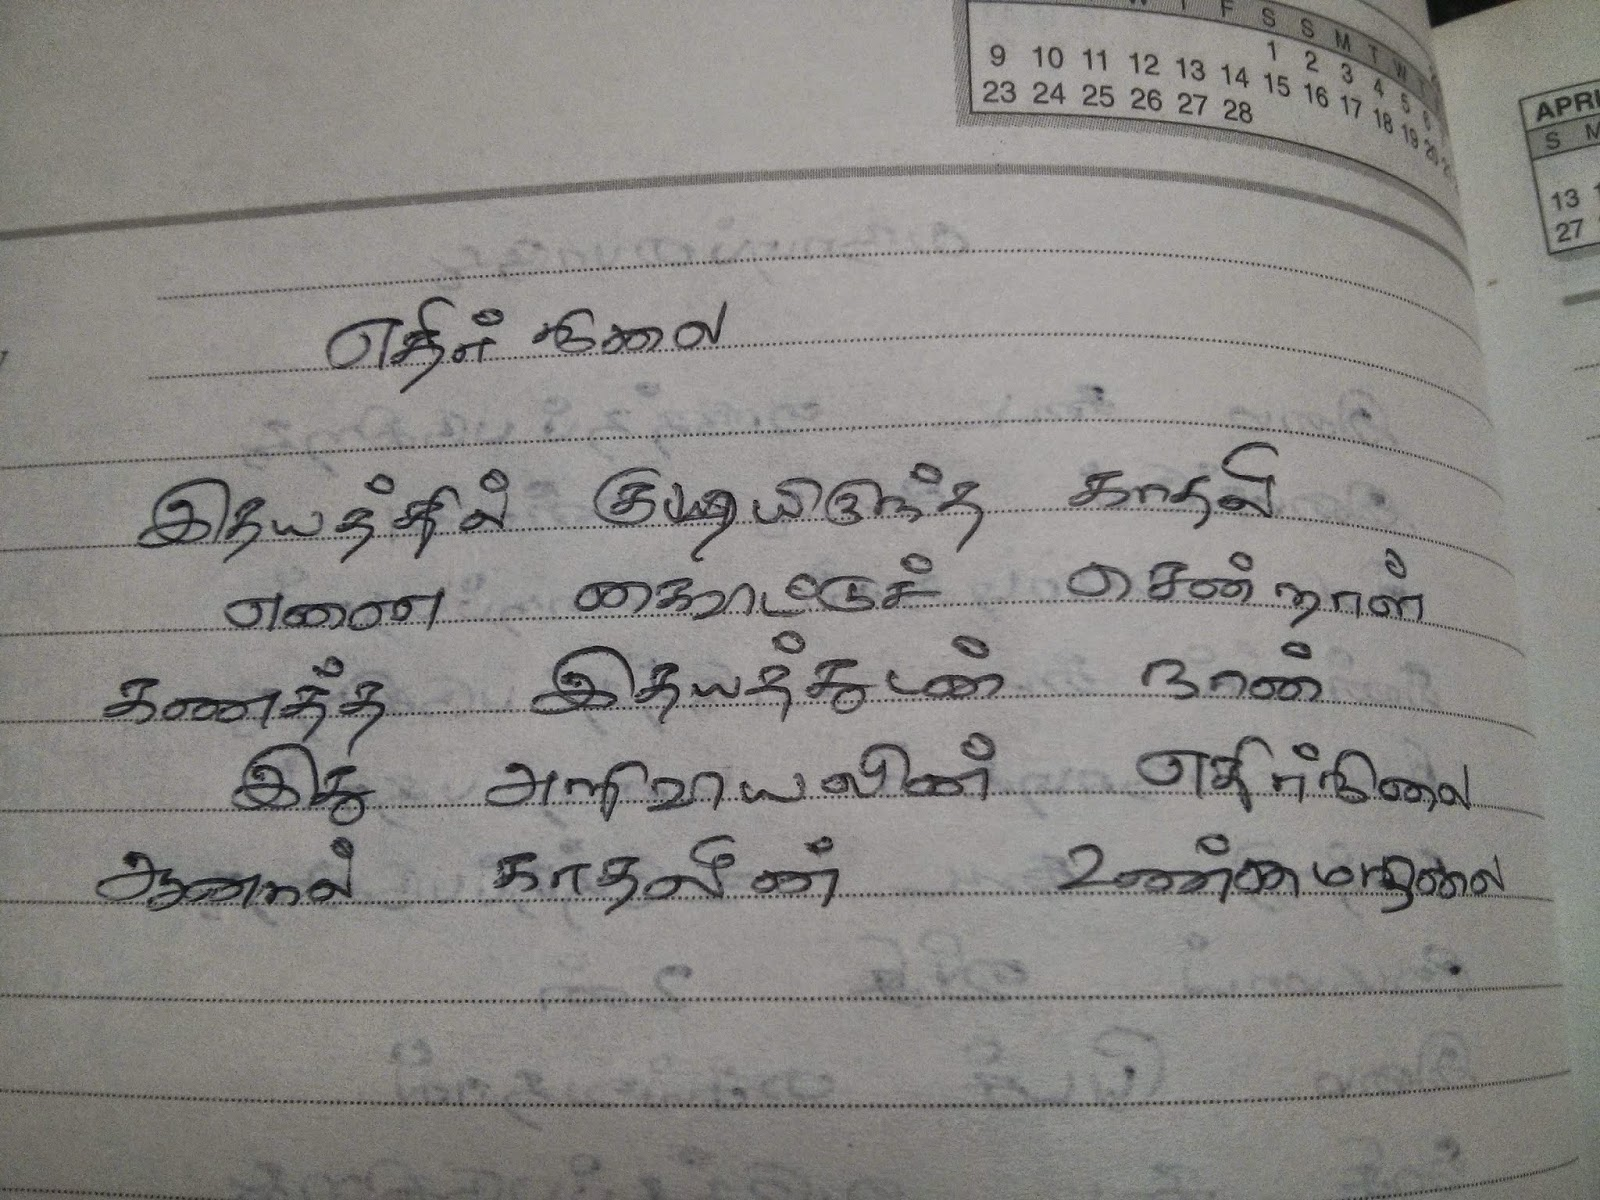 Tamil Kavithaigal - Kavithai Karpanai Virpanaiku alla: Ethirnilai